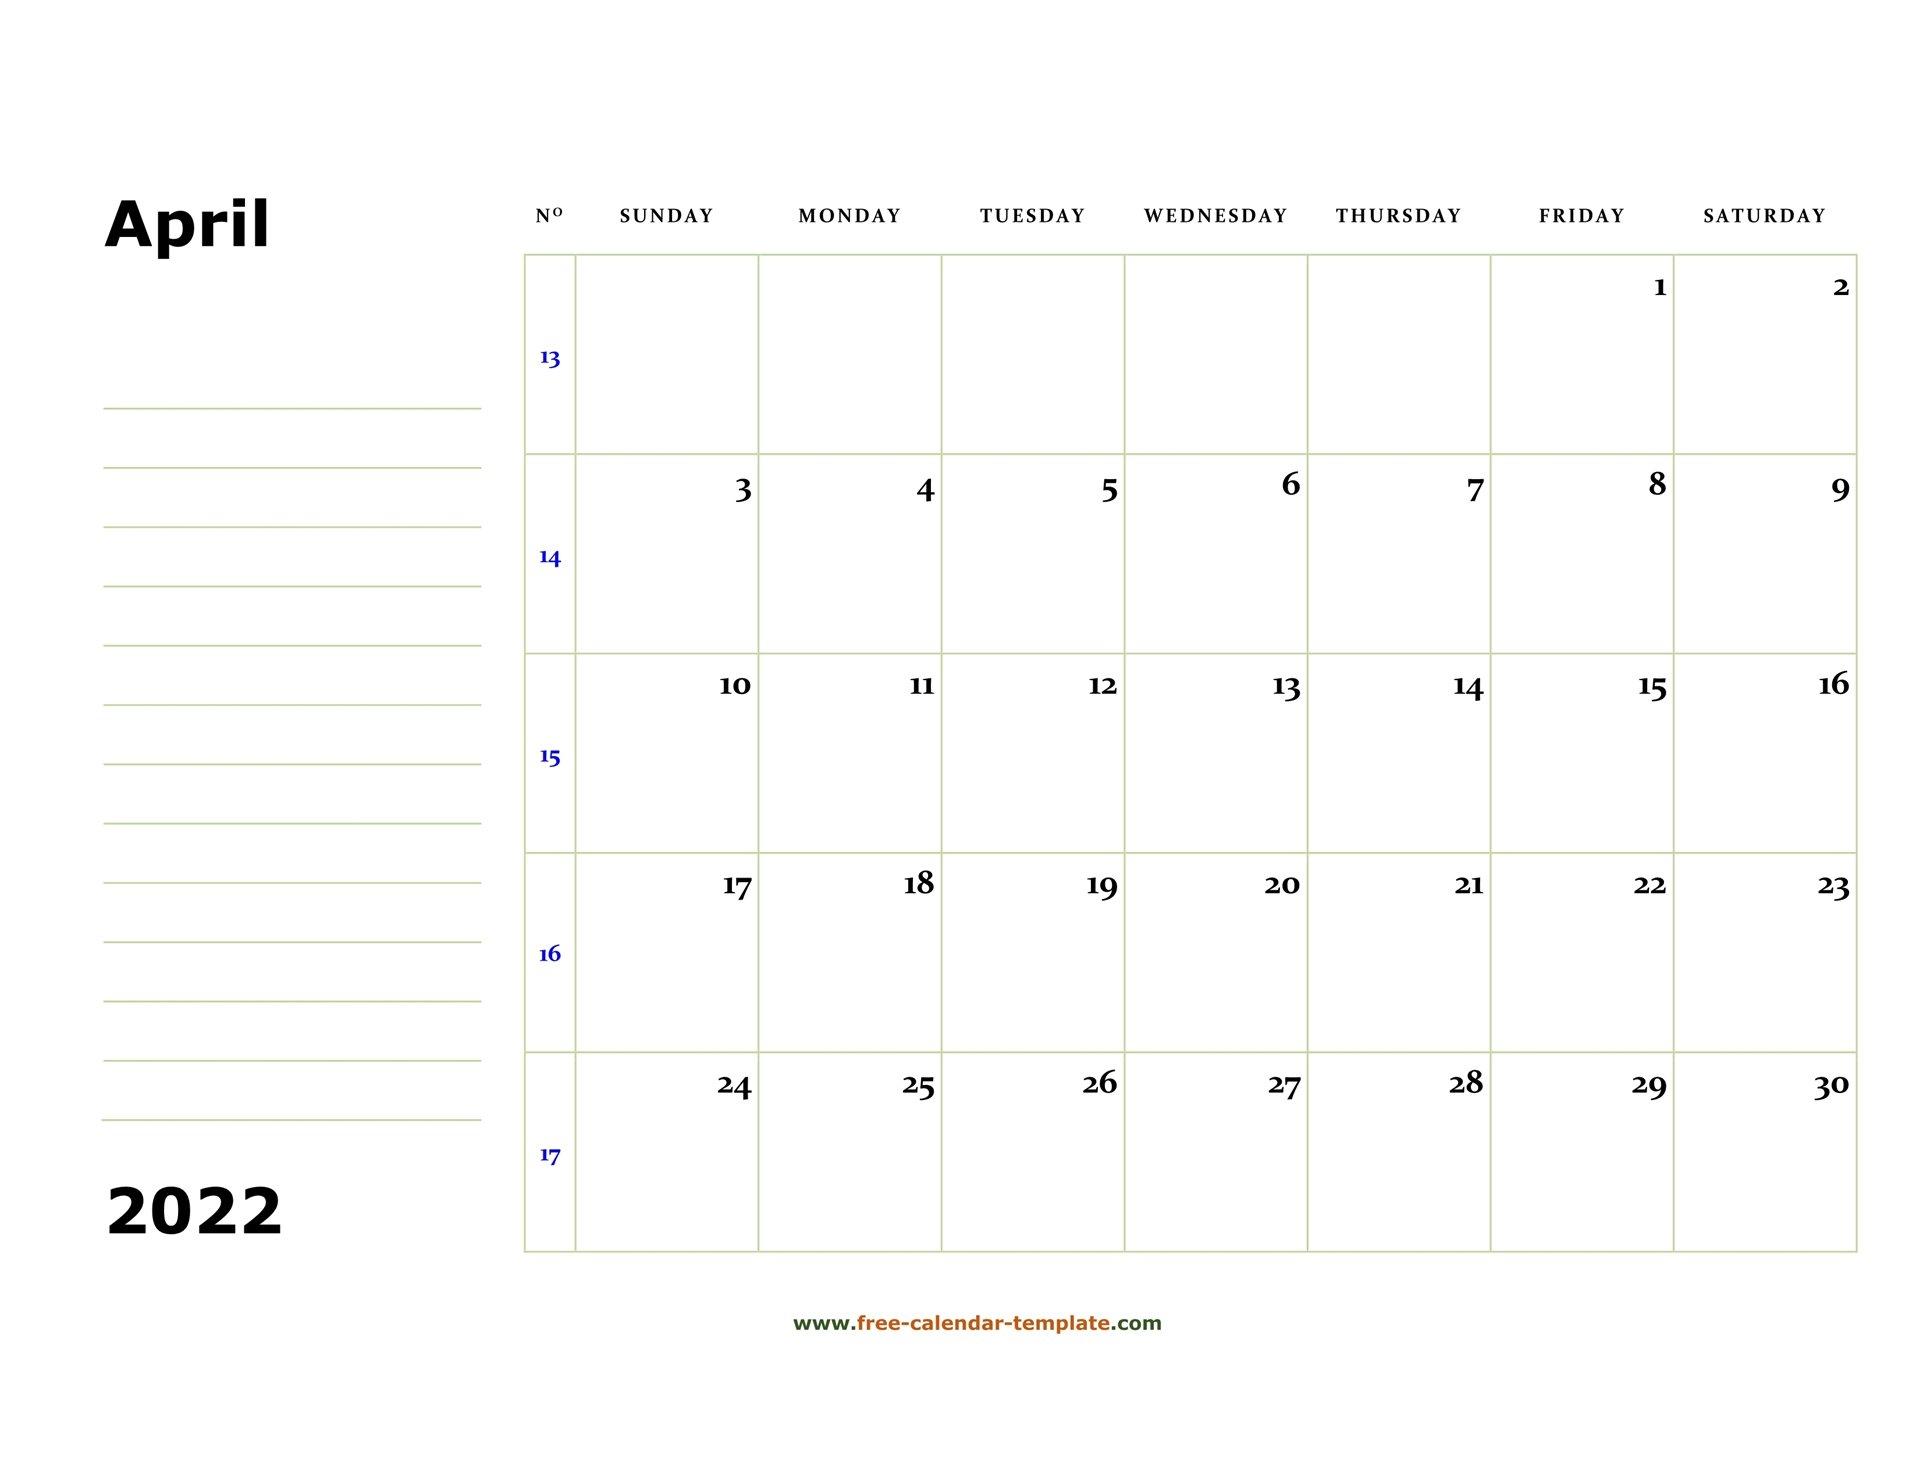 Printable April 2022 Calendar (Box And Lines For Notes with April 2022 Calendar Printable Photo